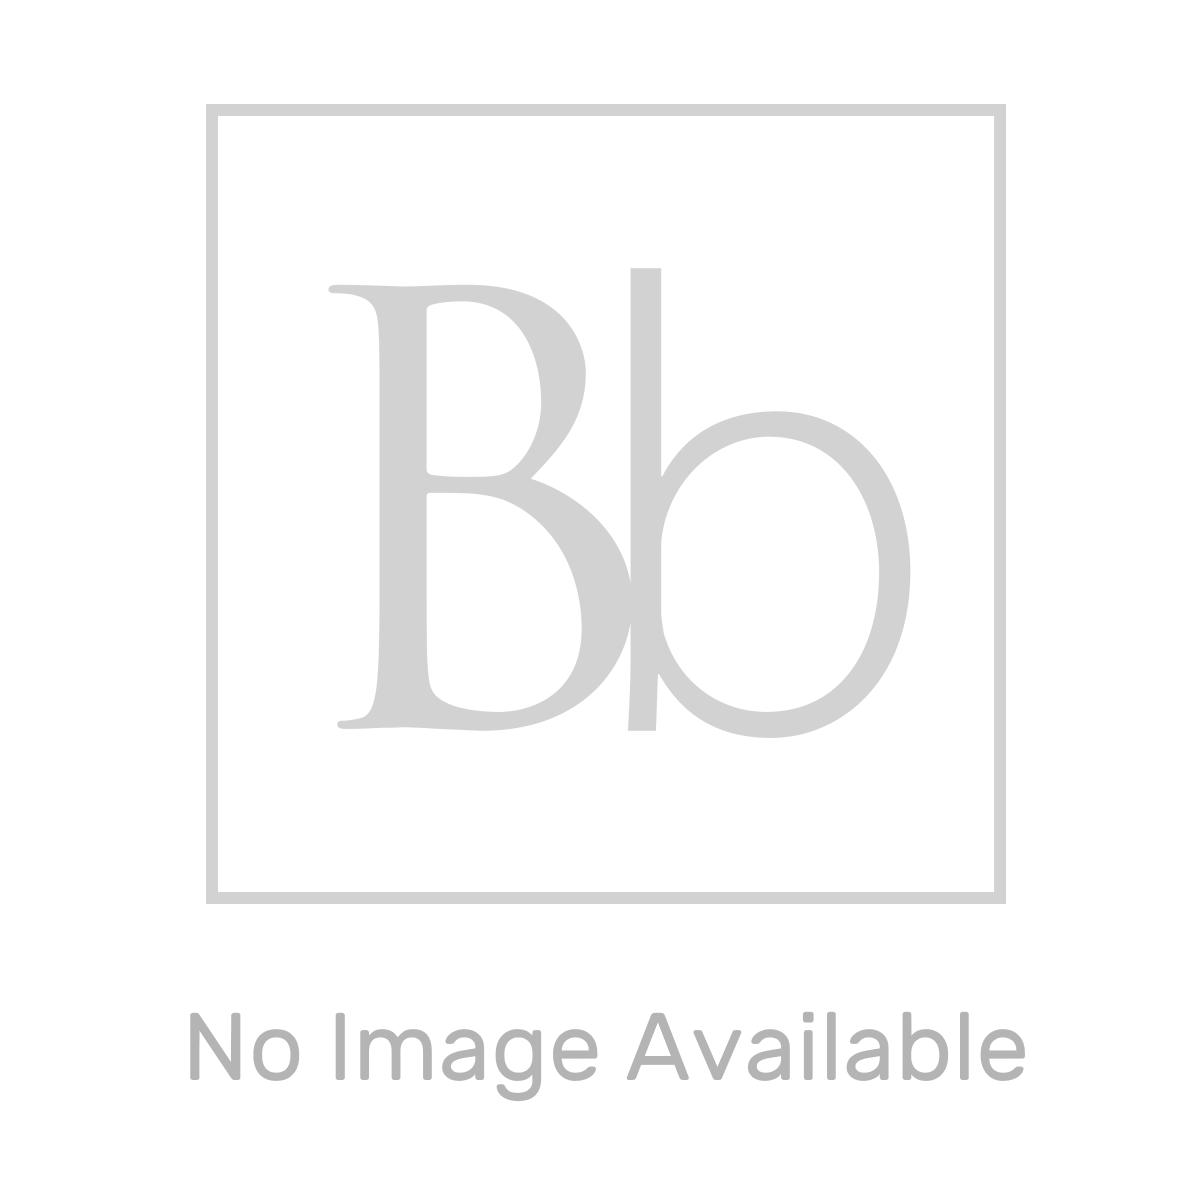 Elation Eko White Gloss Mirror Wall Unit 750mm